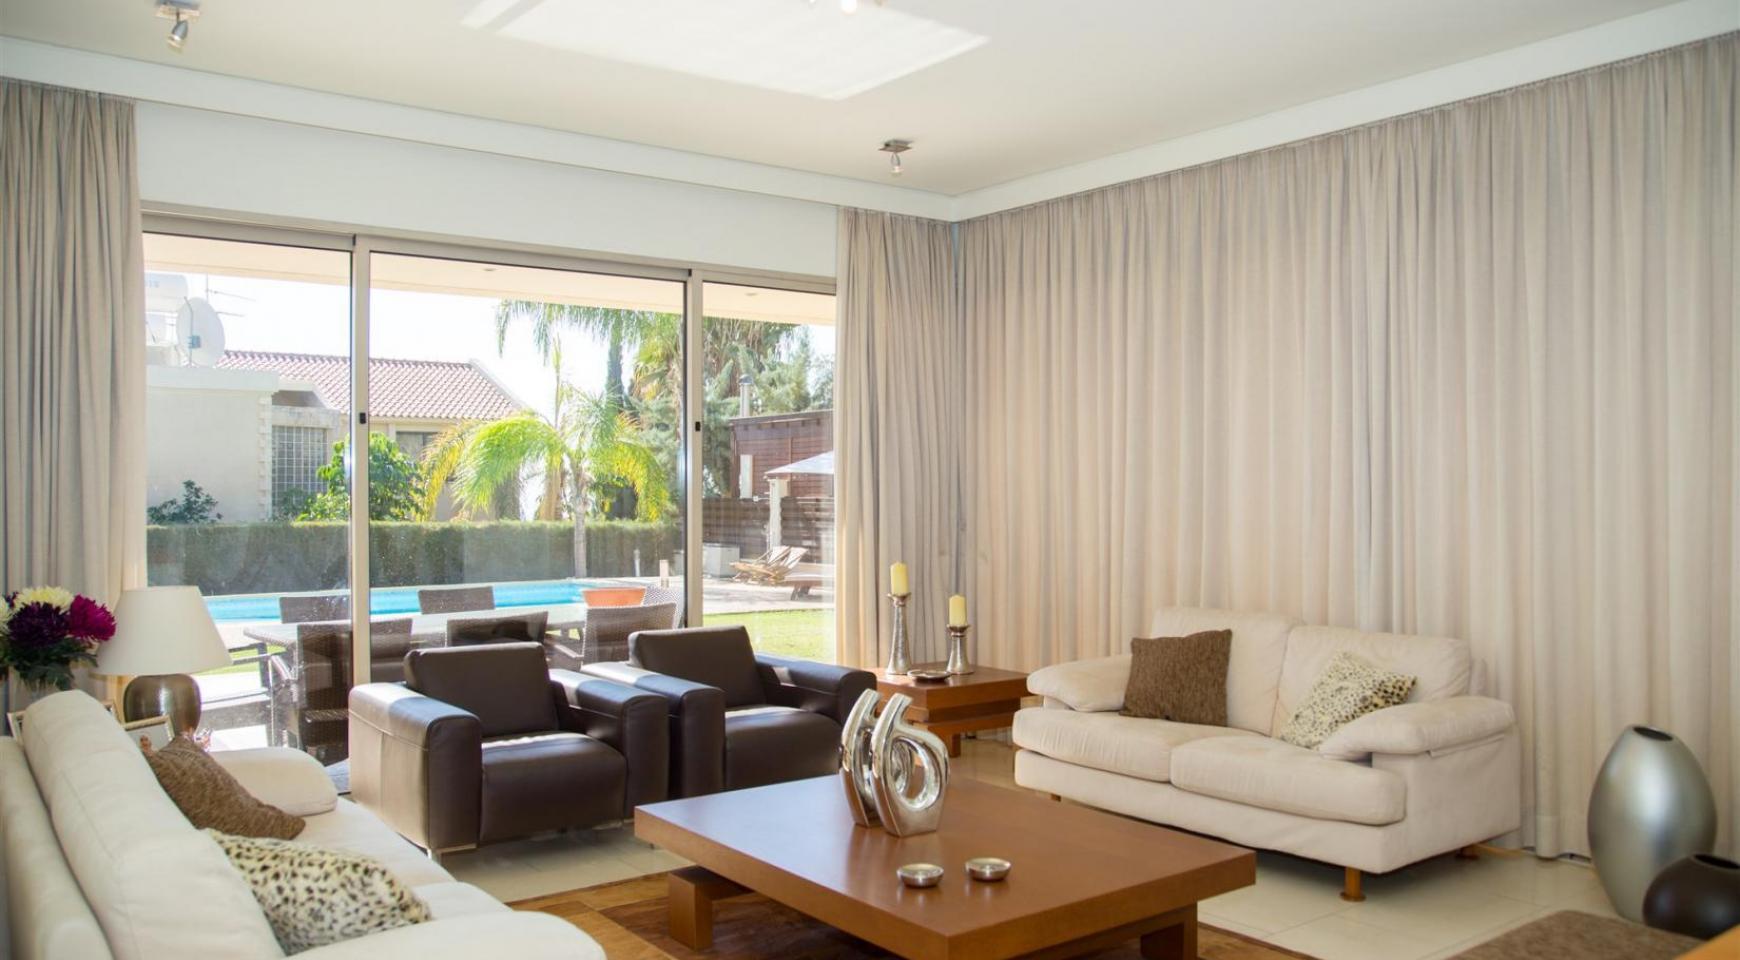 Modern Luxury 4 Bedroom Villa in Sfalagiotisa, Agios Athanasios - 17